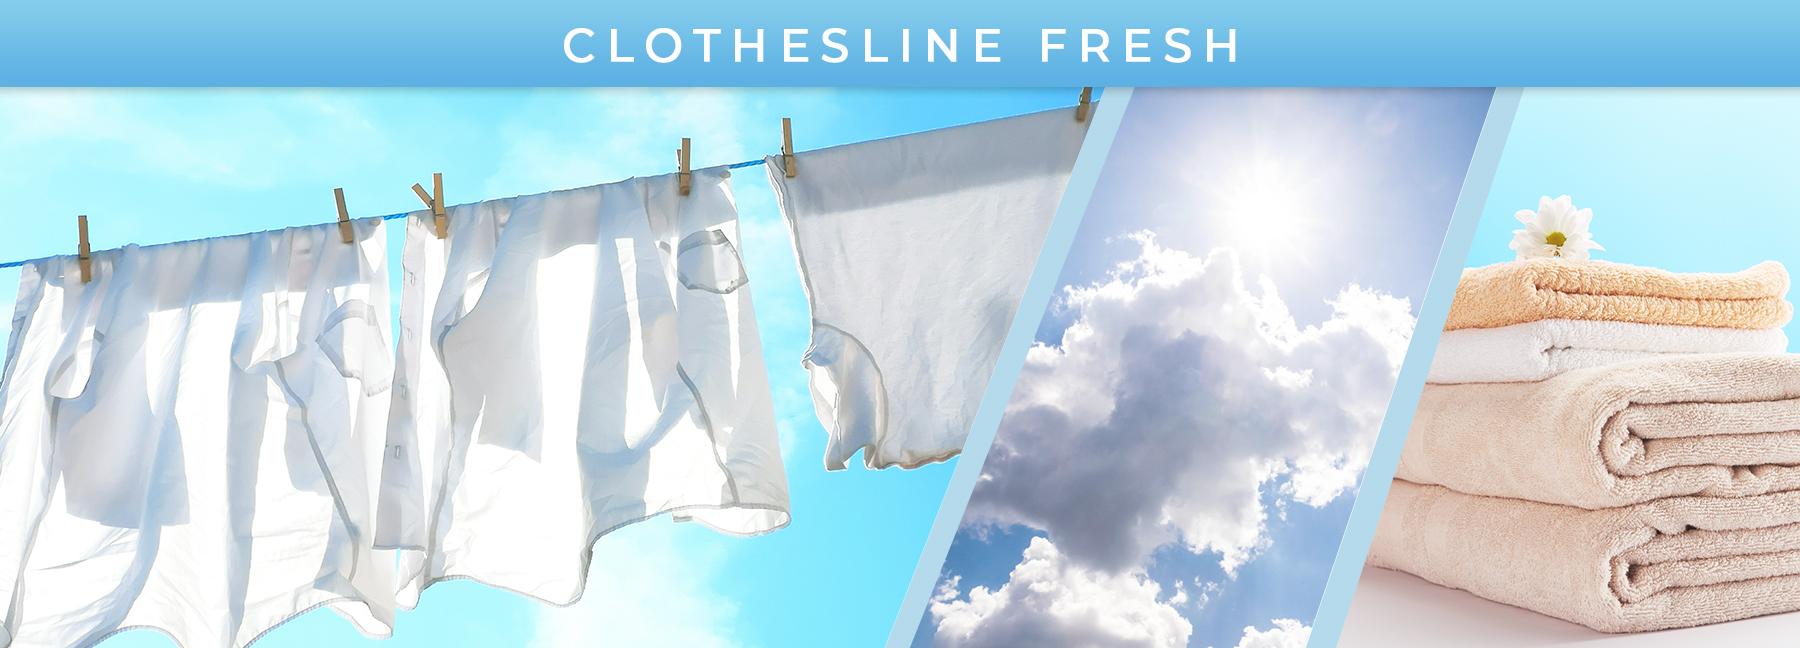 Clothesline Fresh fragrance elements